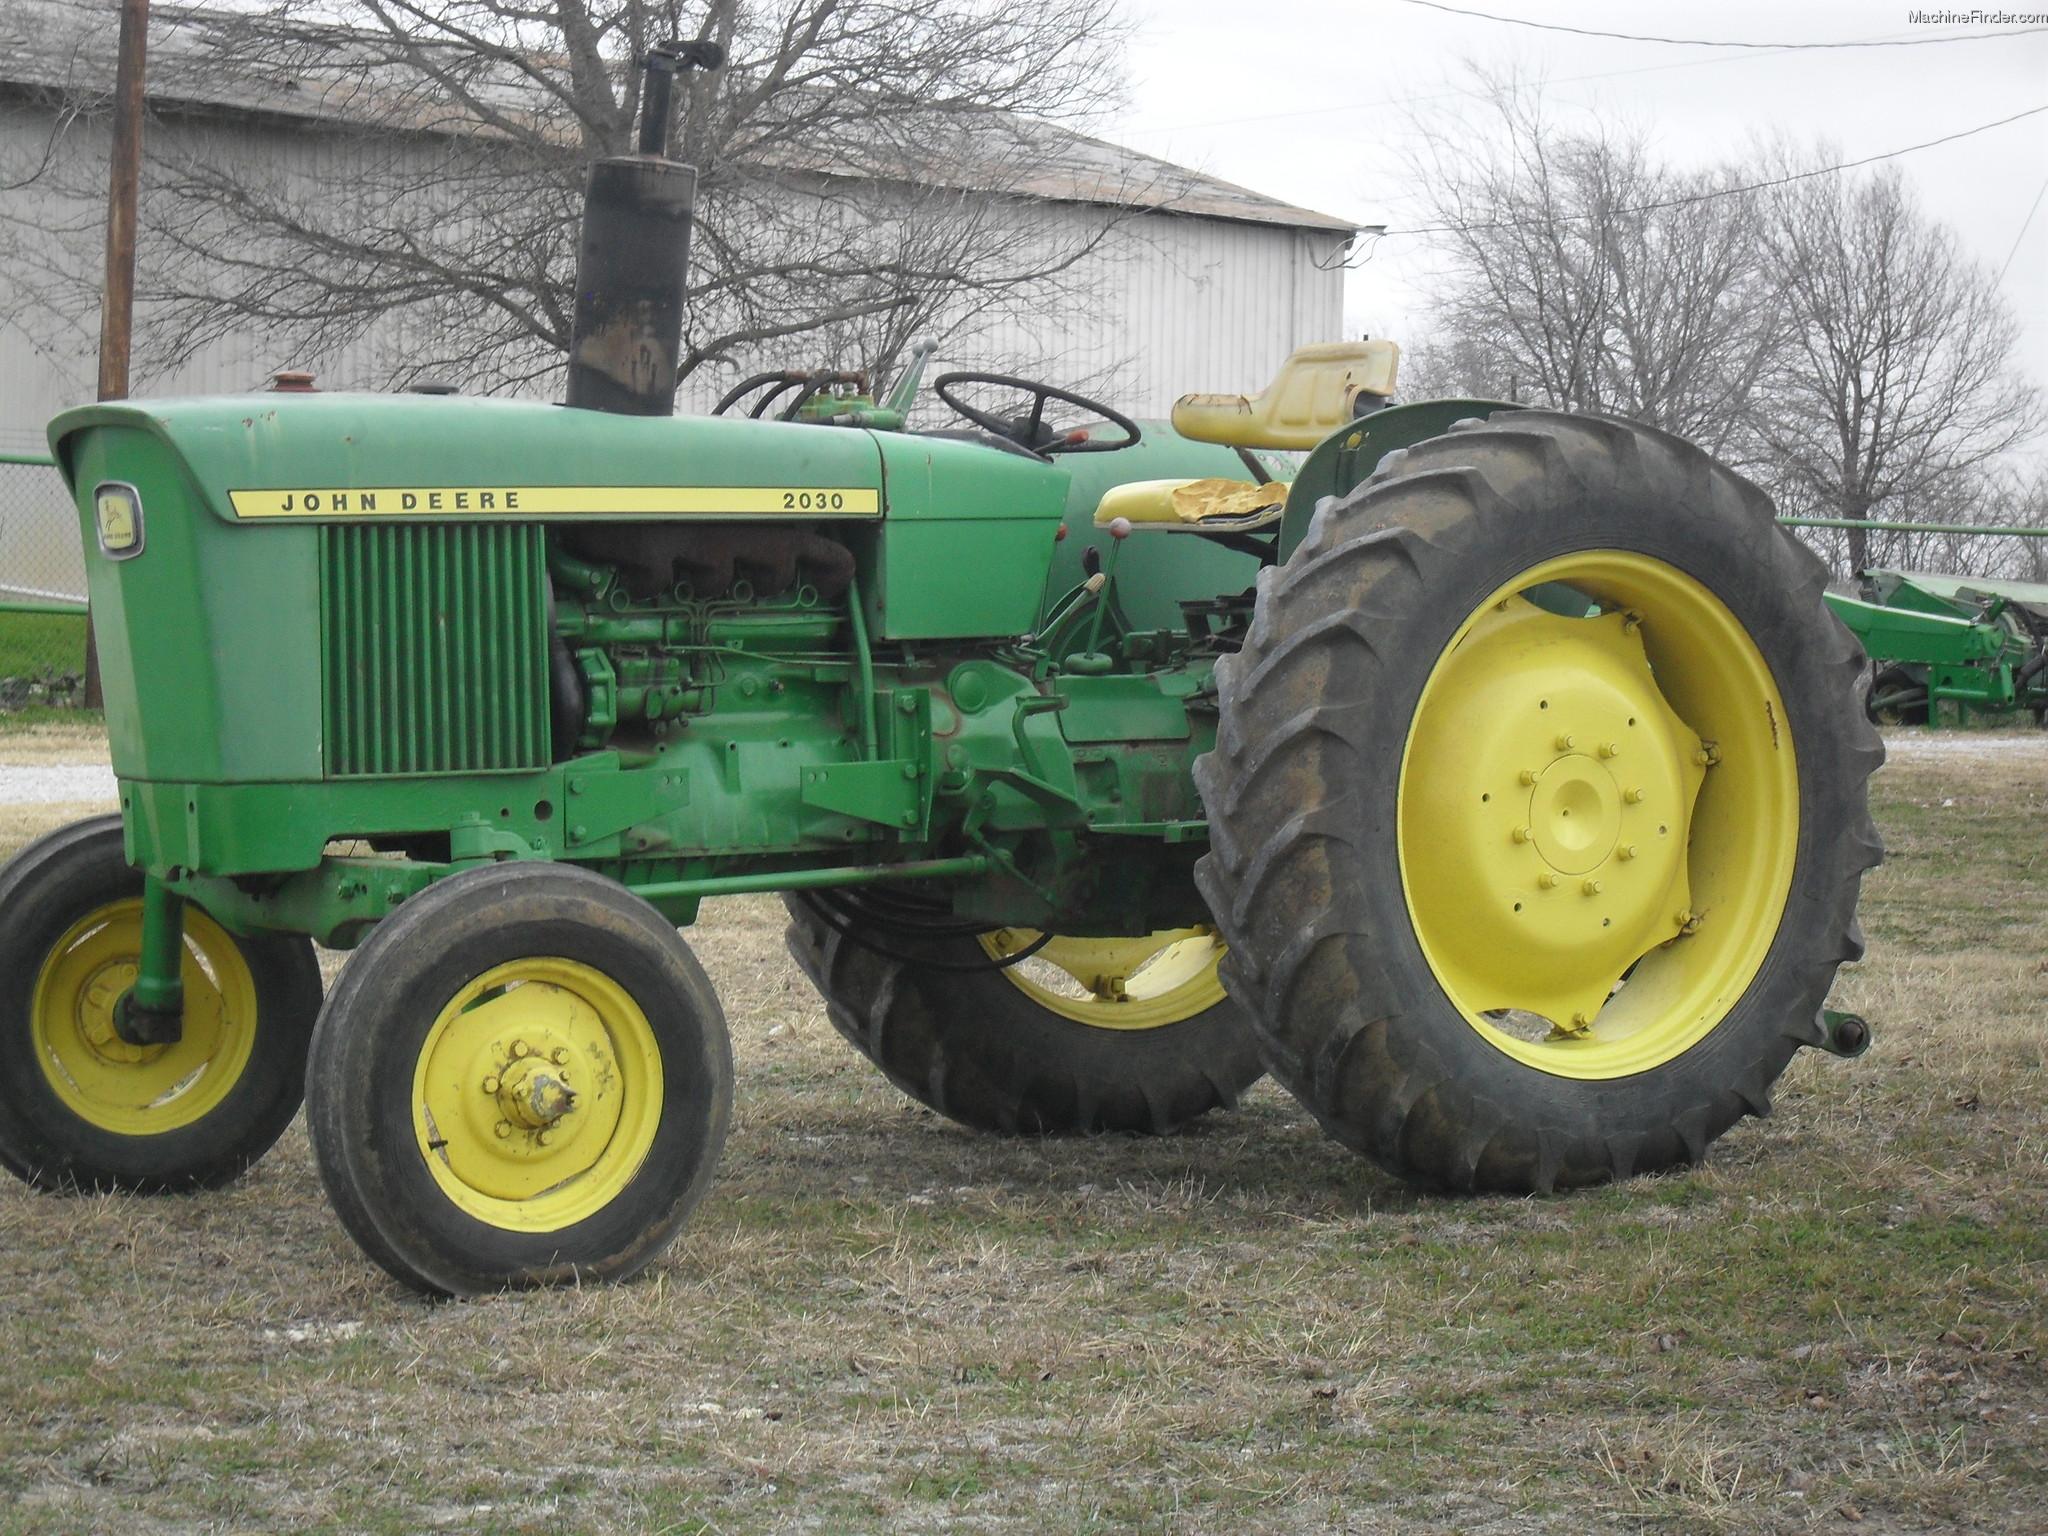 1971 John Deere 2030 Tractors - Utility (40-100hp) - John ...